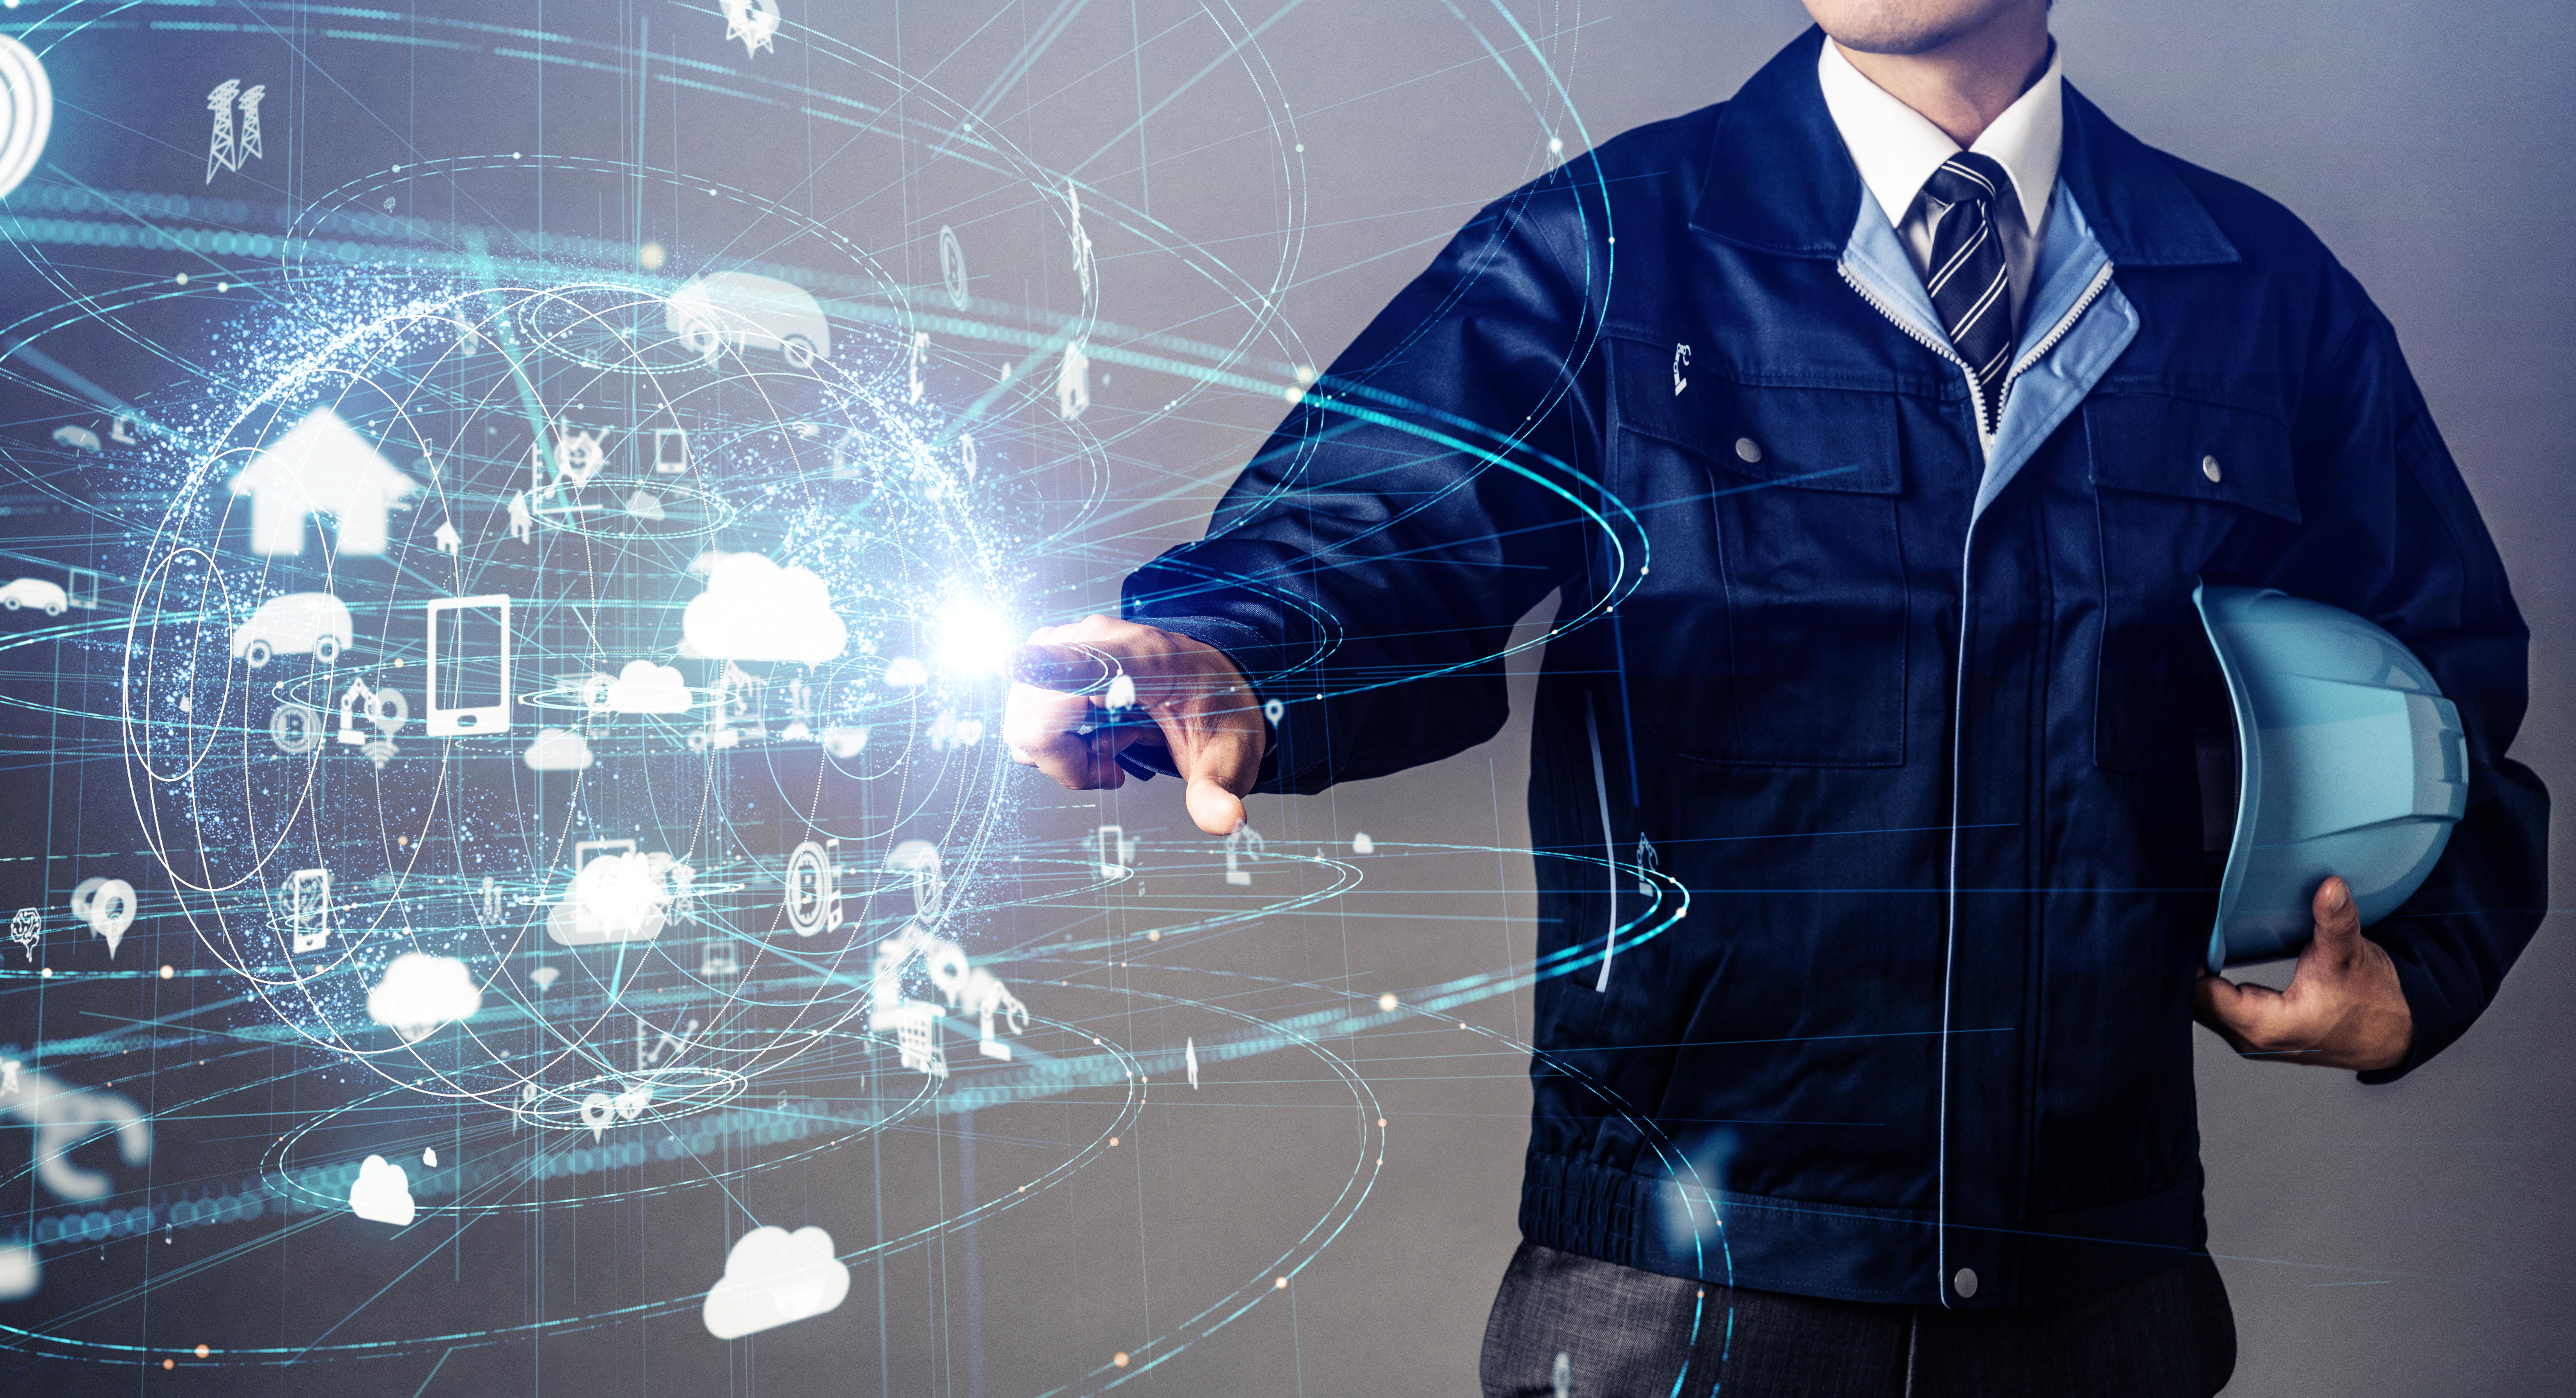 Digital Twin and IIoT Technologies